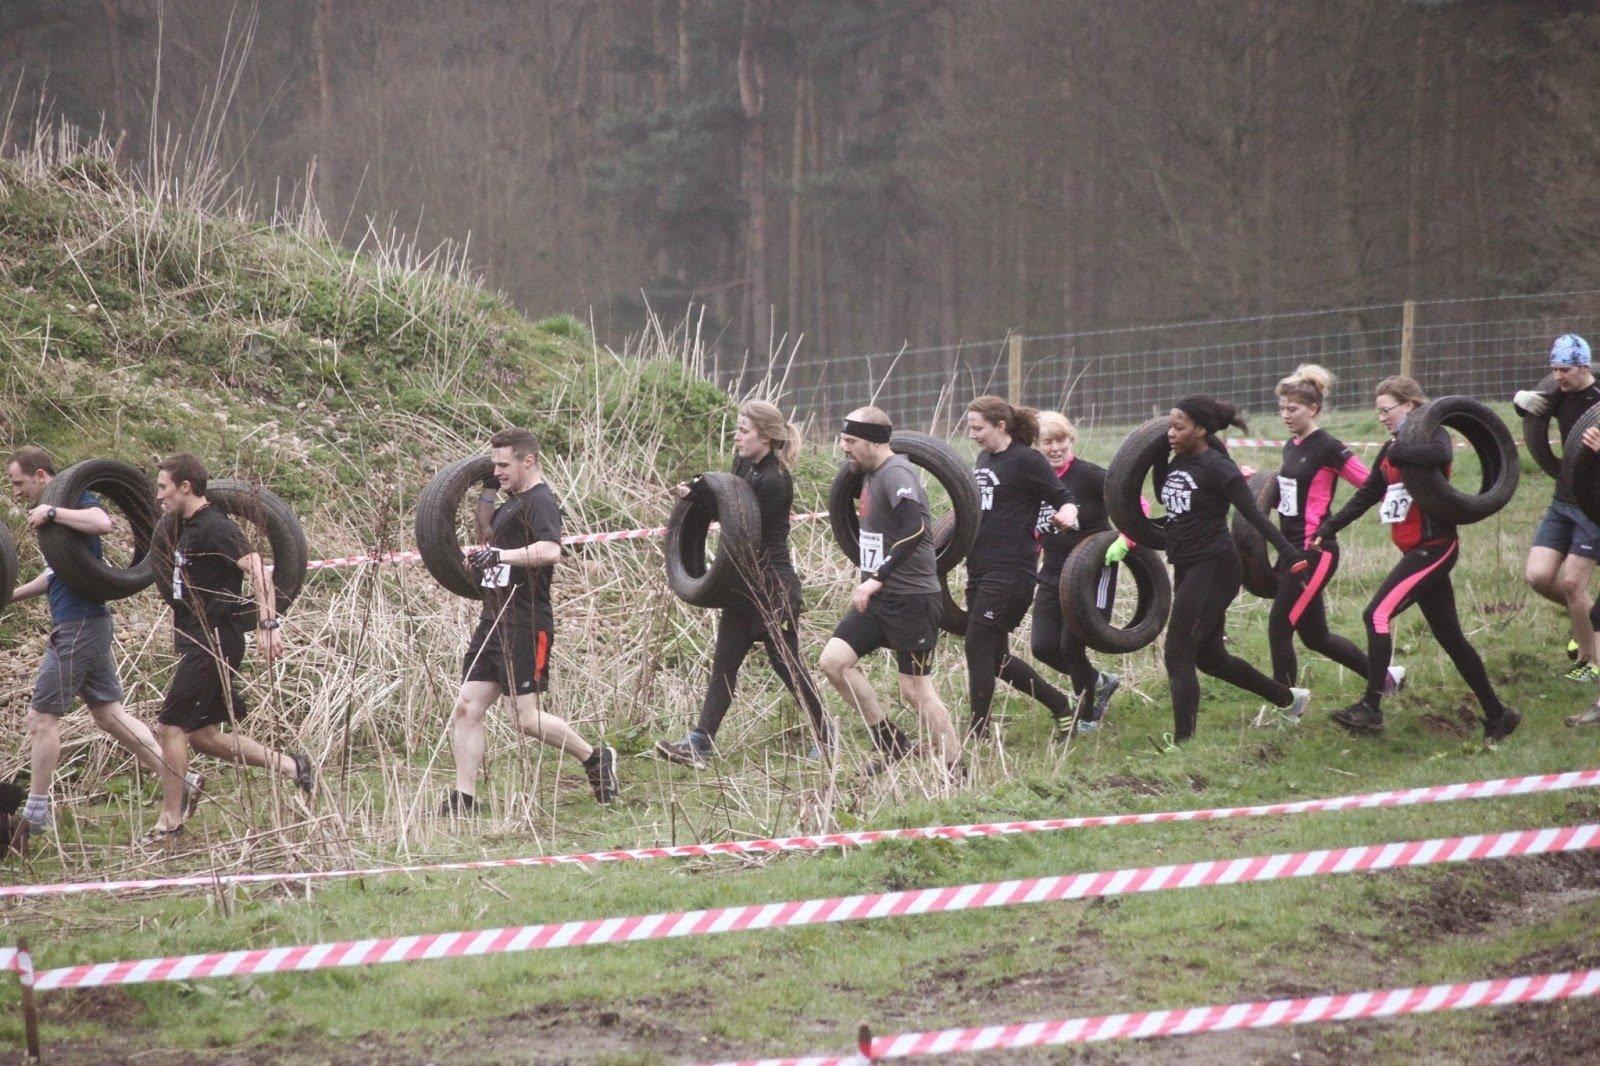 10 Fantastic Mud Run Team Name Ideas the dirty muddy thirties loads of awesome spartan race team name ideas 2020